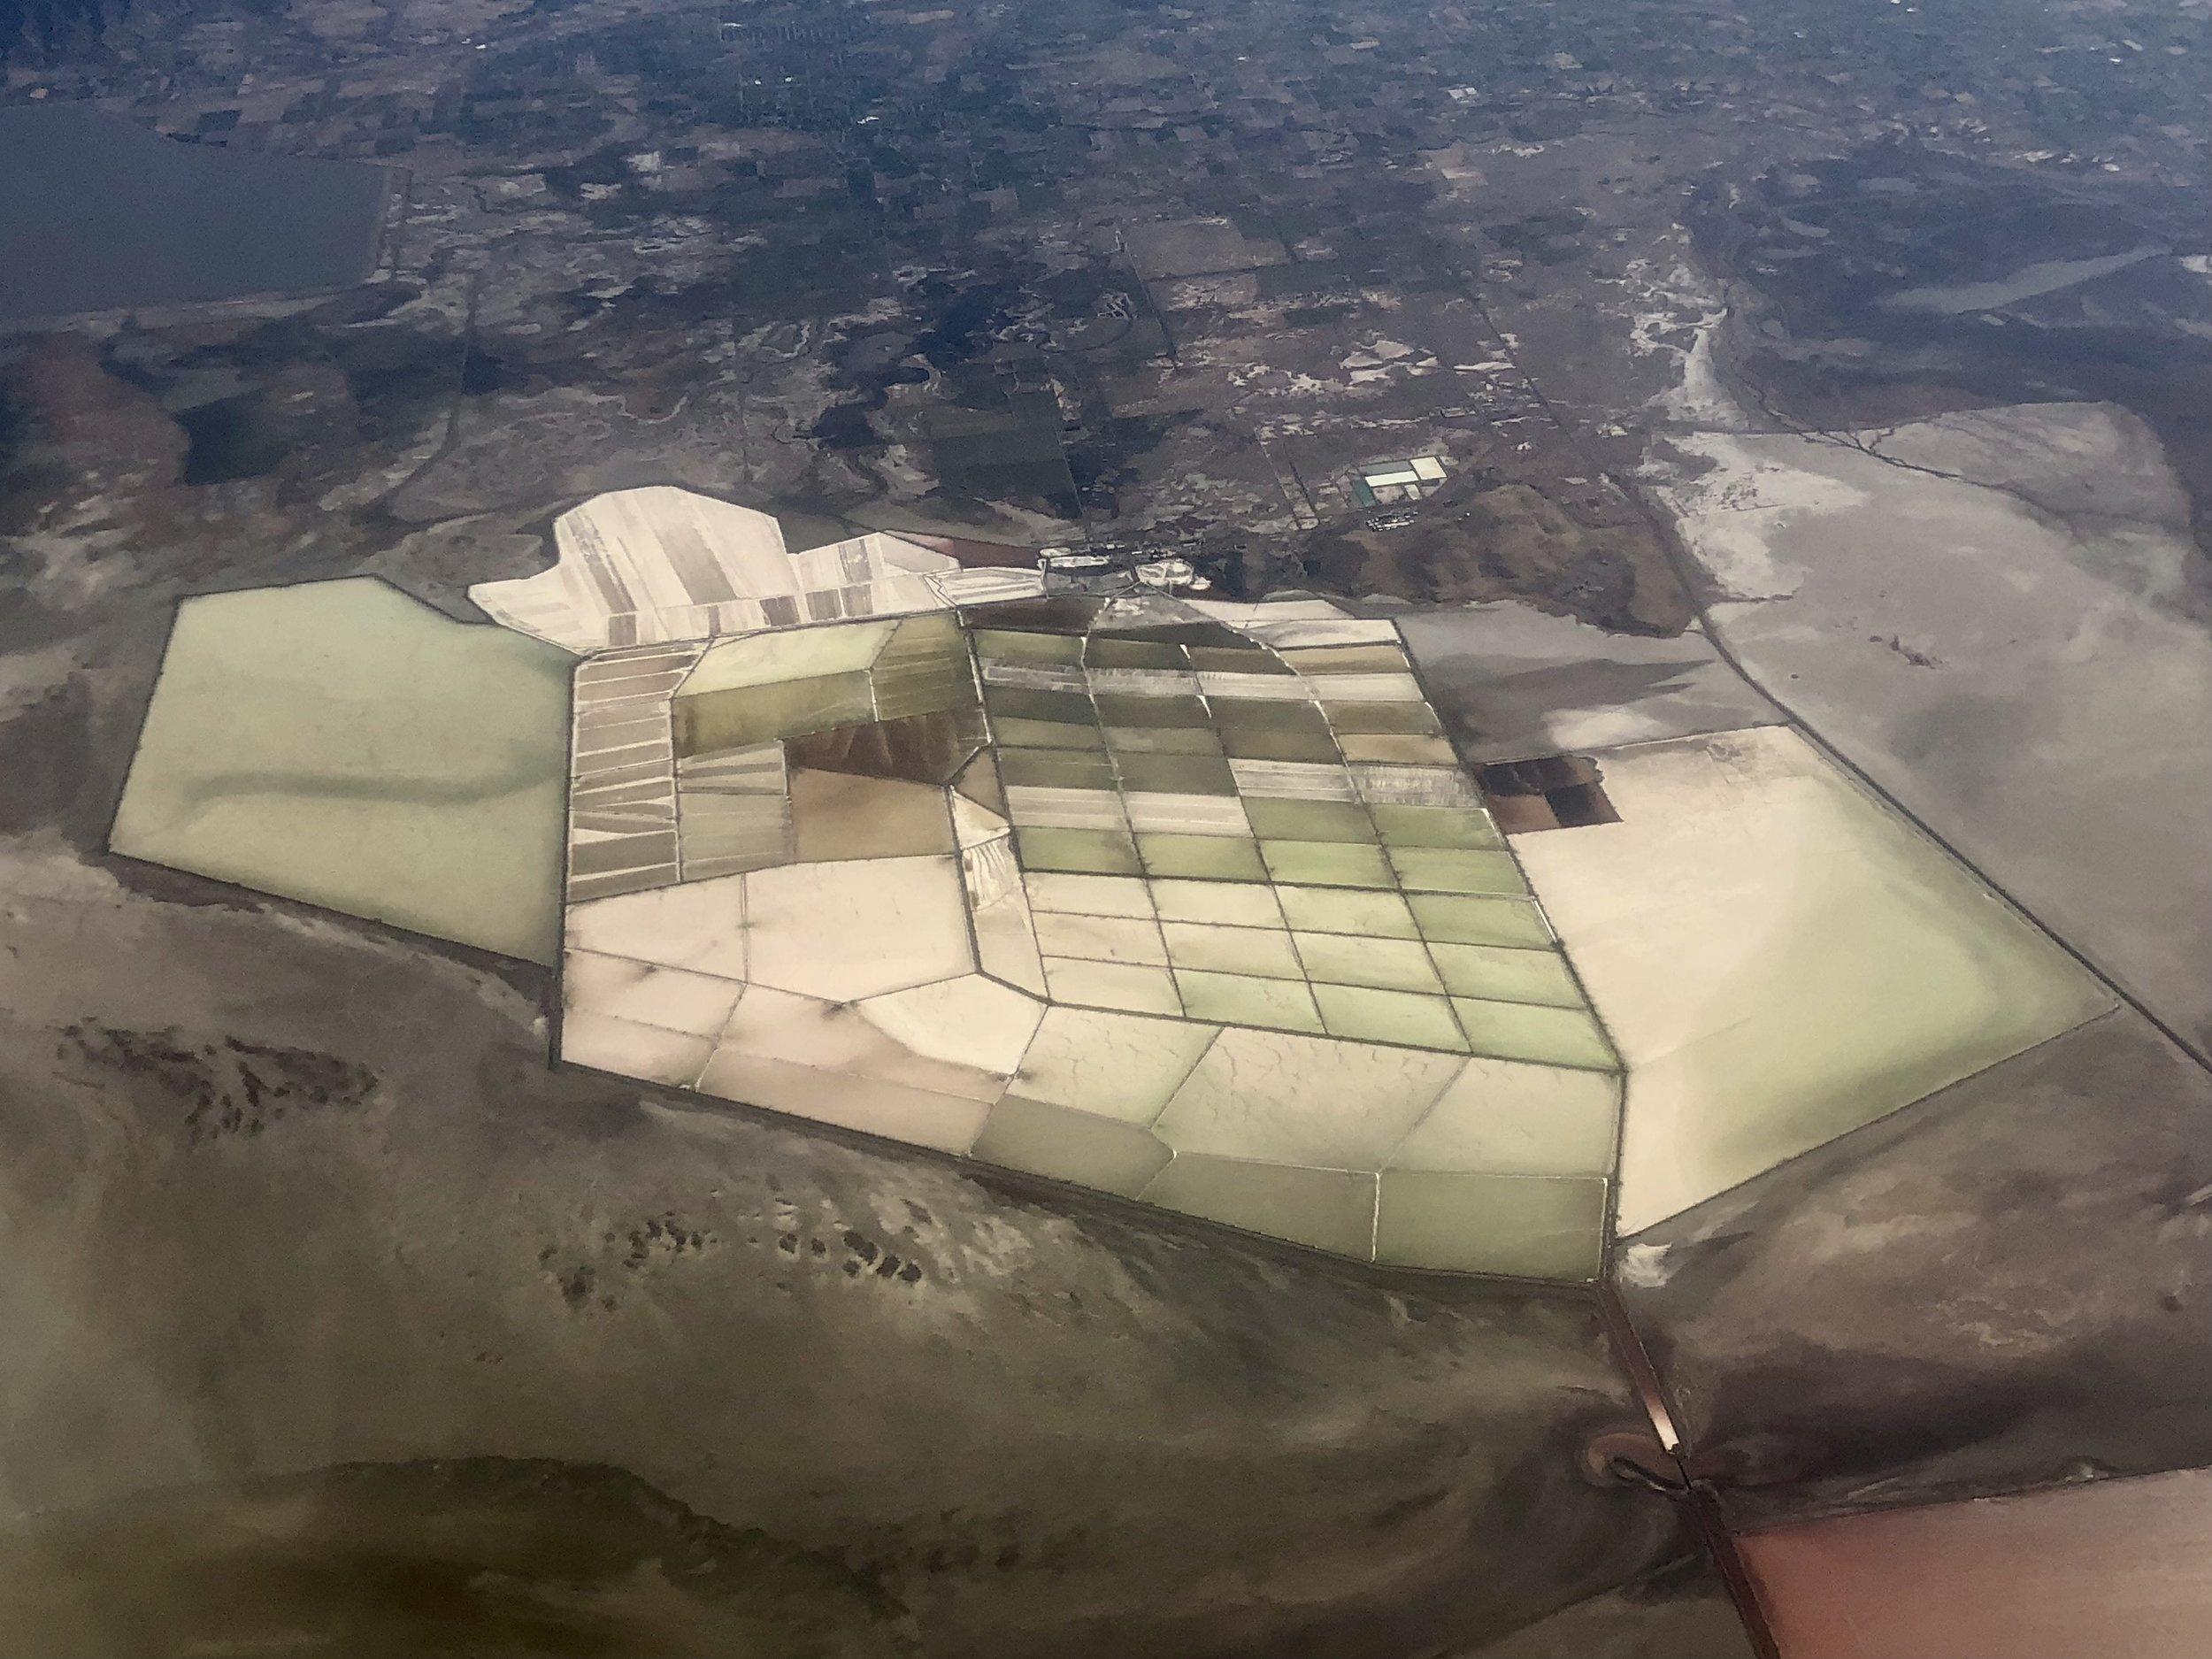 Compass Minerals' Great Salt Lake facility near Ogden, Utah